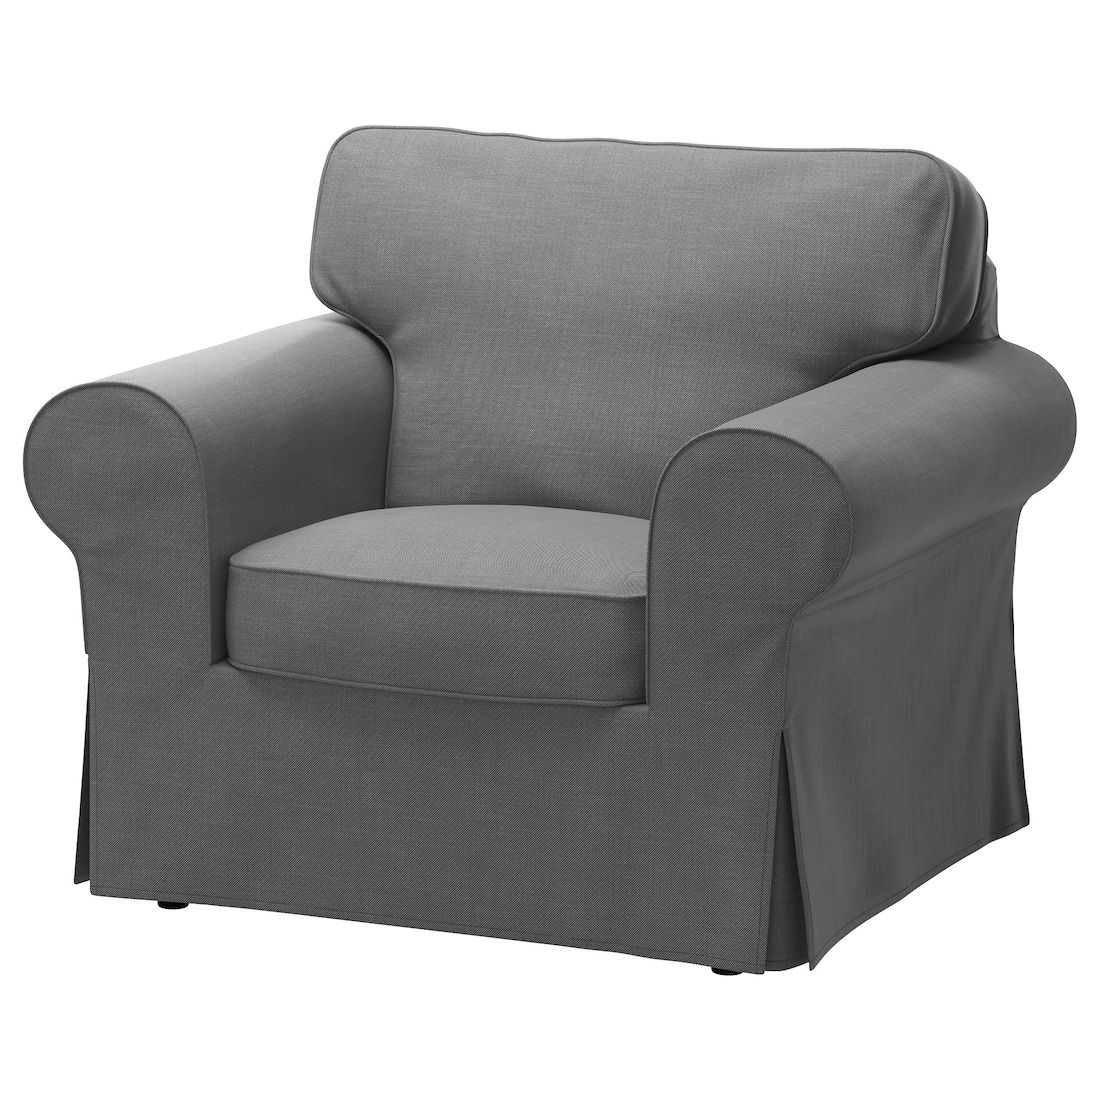 EKTORP Chair cover, Nordvalla dark gray IKEA in 2020